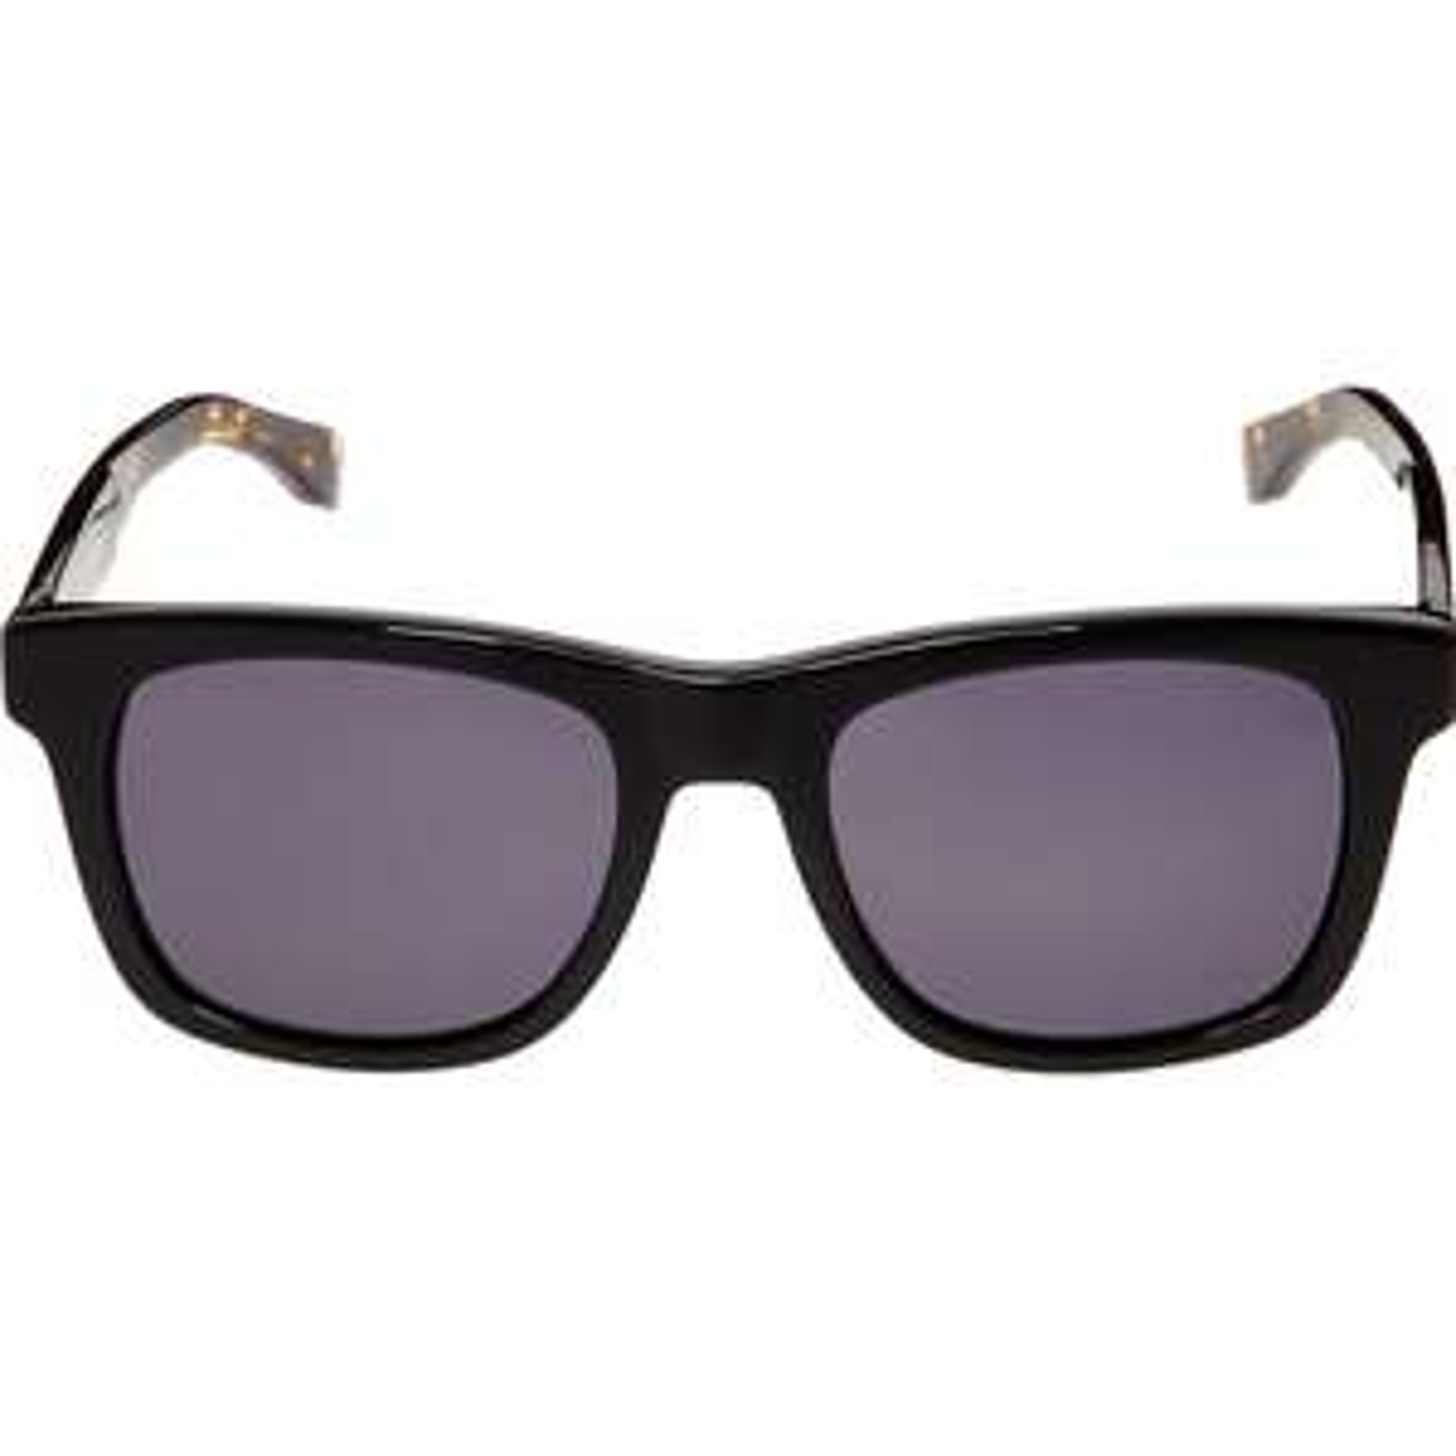 Hugo Boss Black Preppy Sunglasses - £29.99 / £33.98 delivered @ TK Maxx